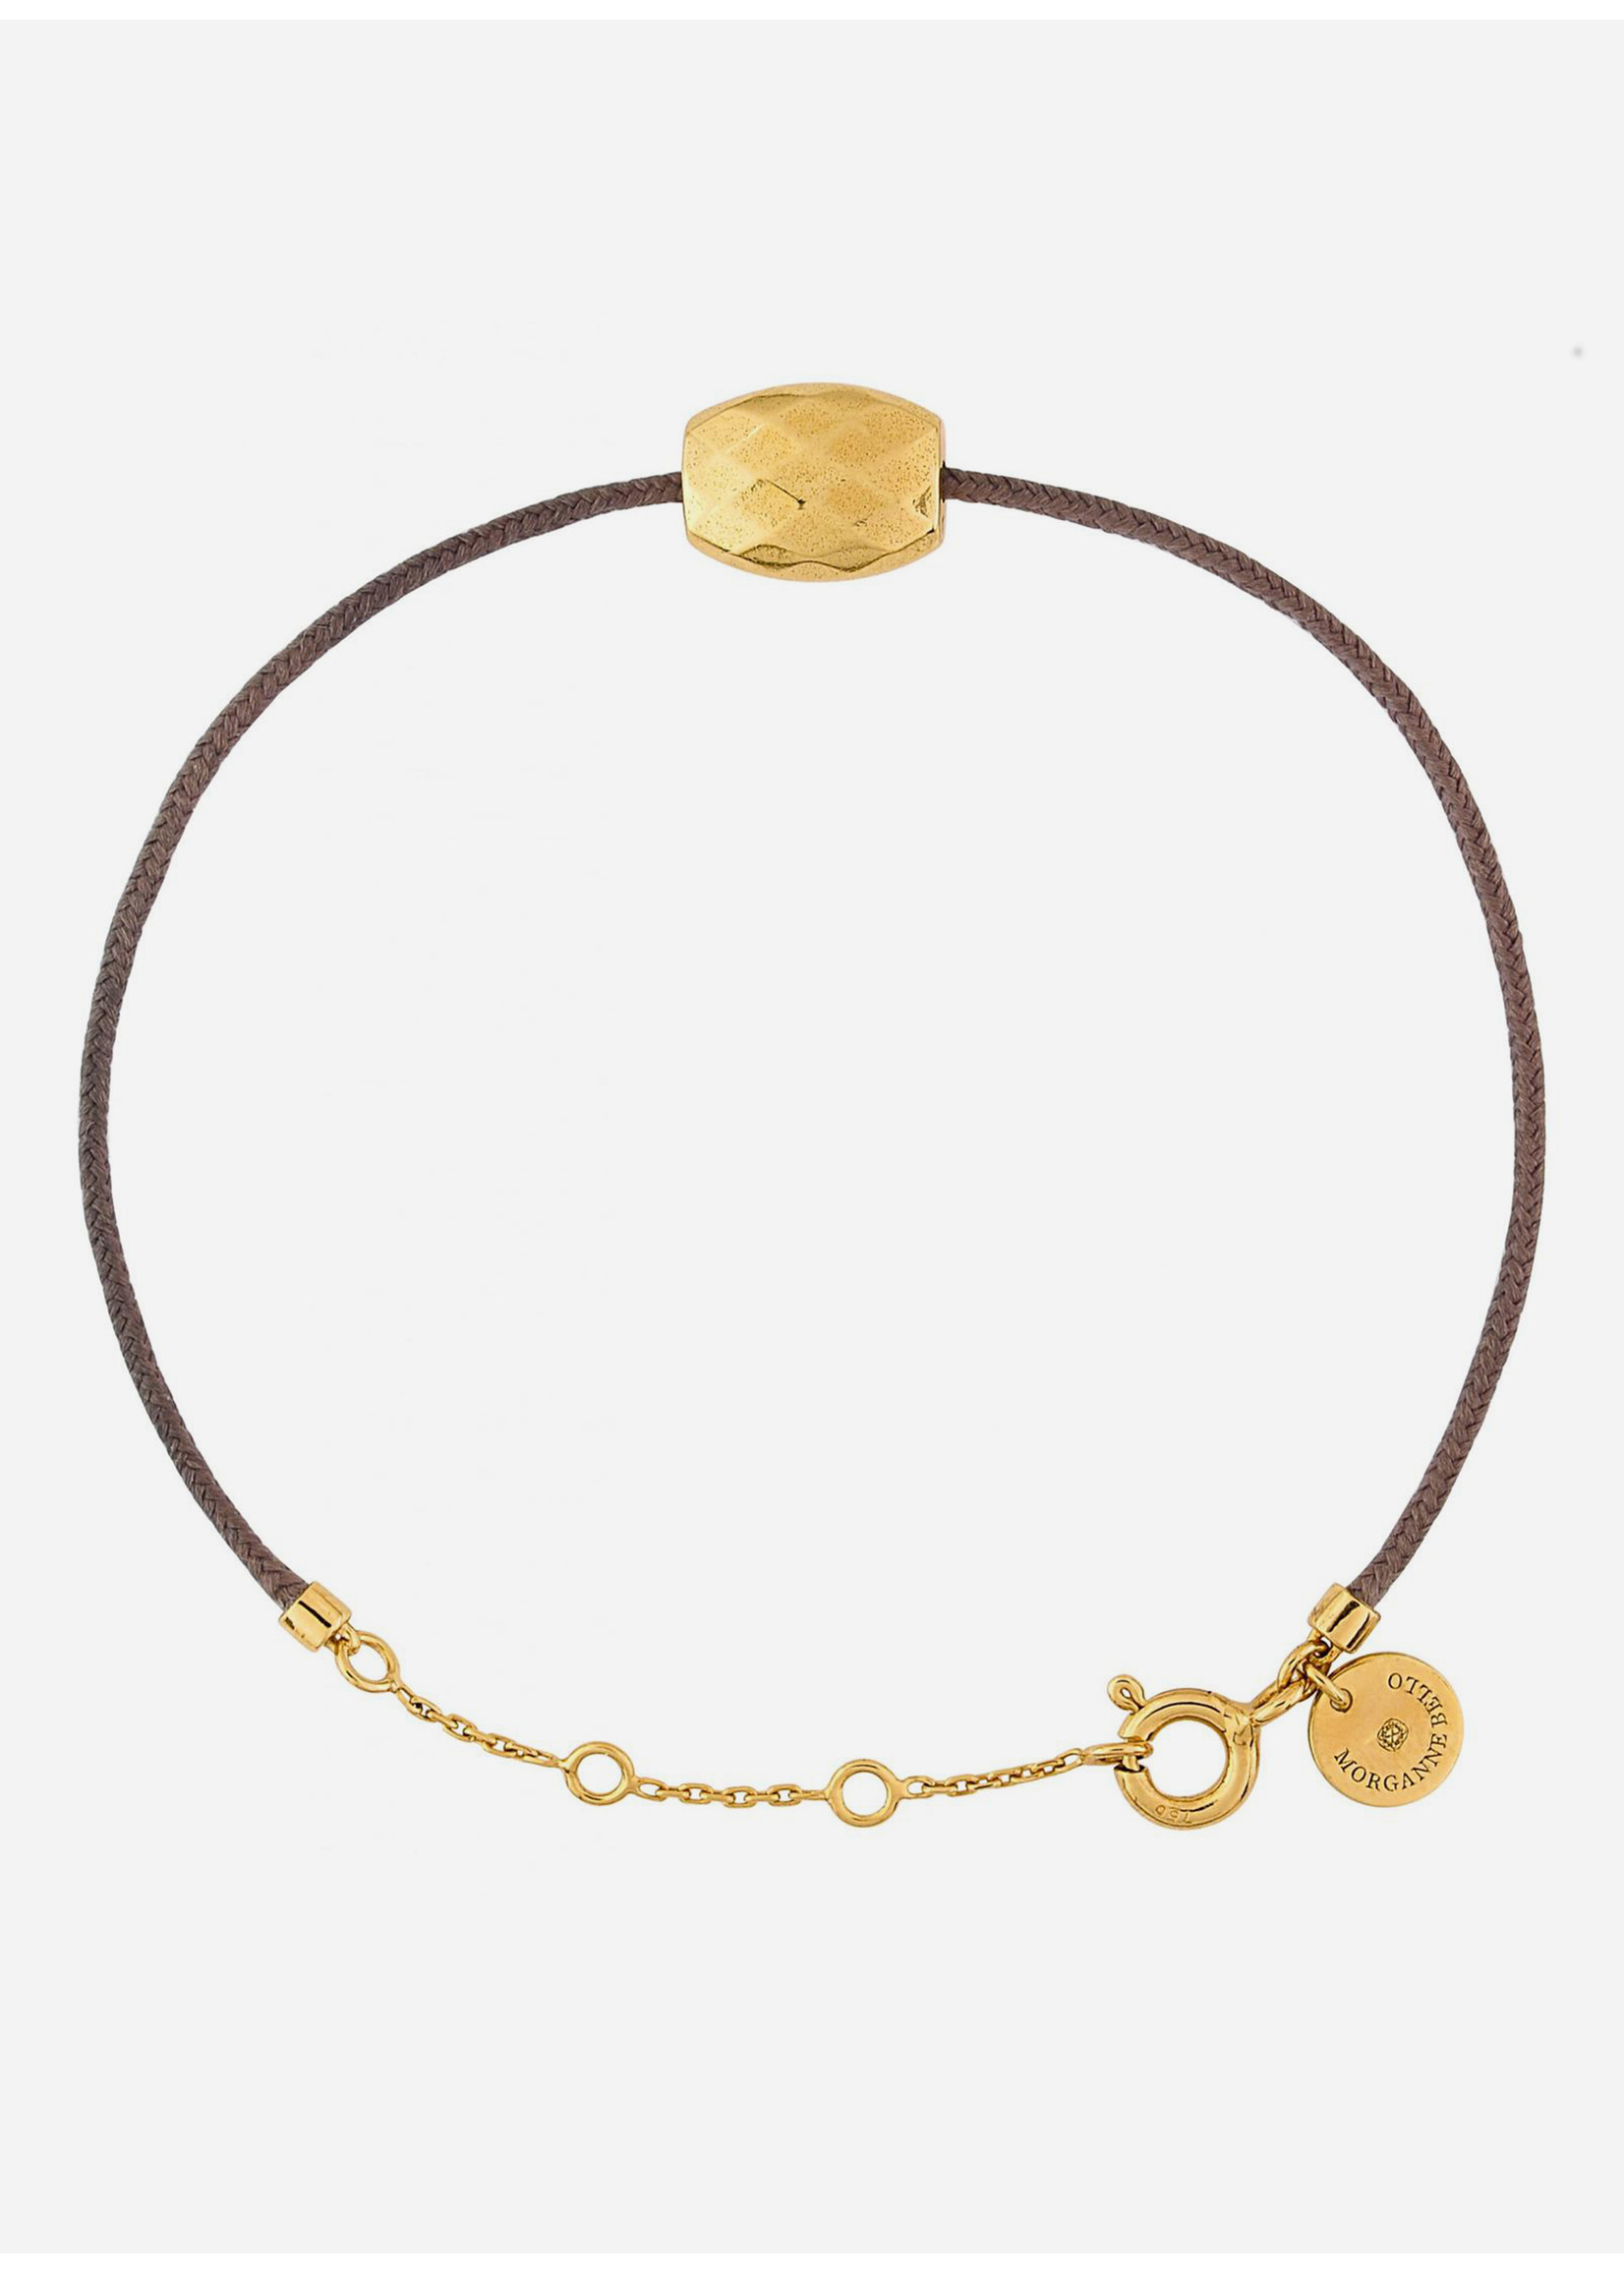 Morganne Bello Pepite yellow gold bracelet